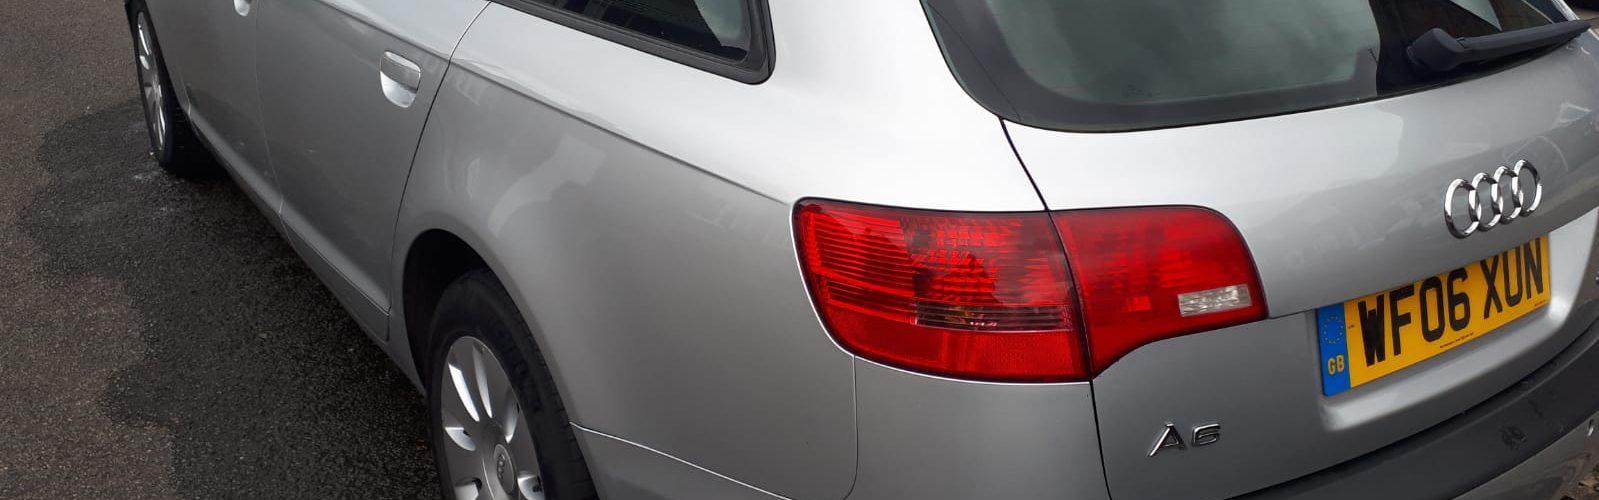 Silver 2006 Audi A6 Estate For Sale - exterior rear left